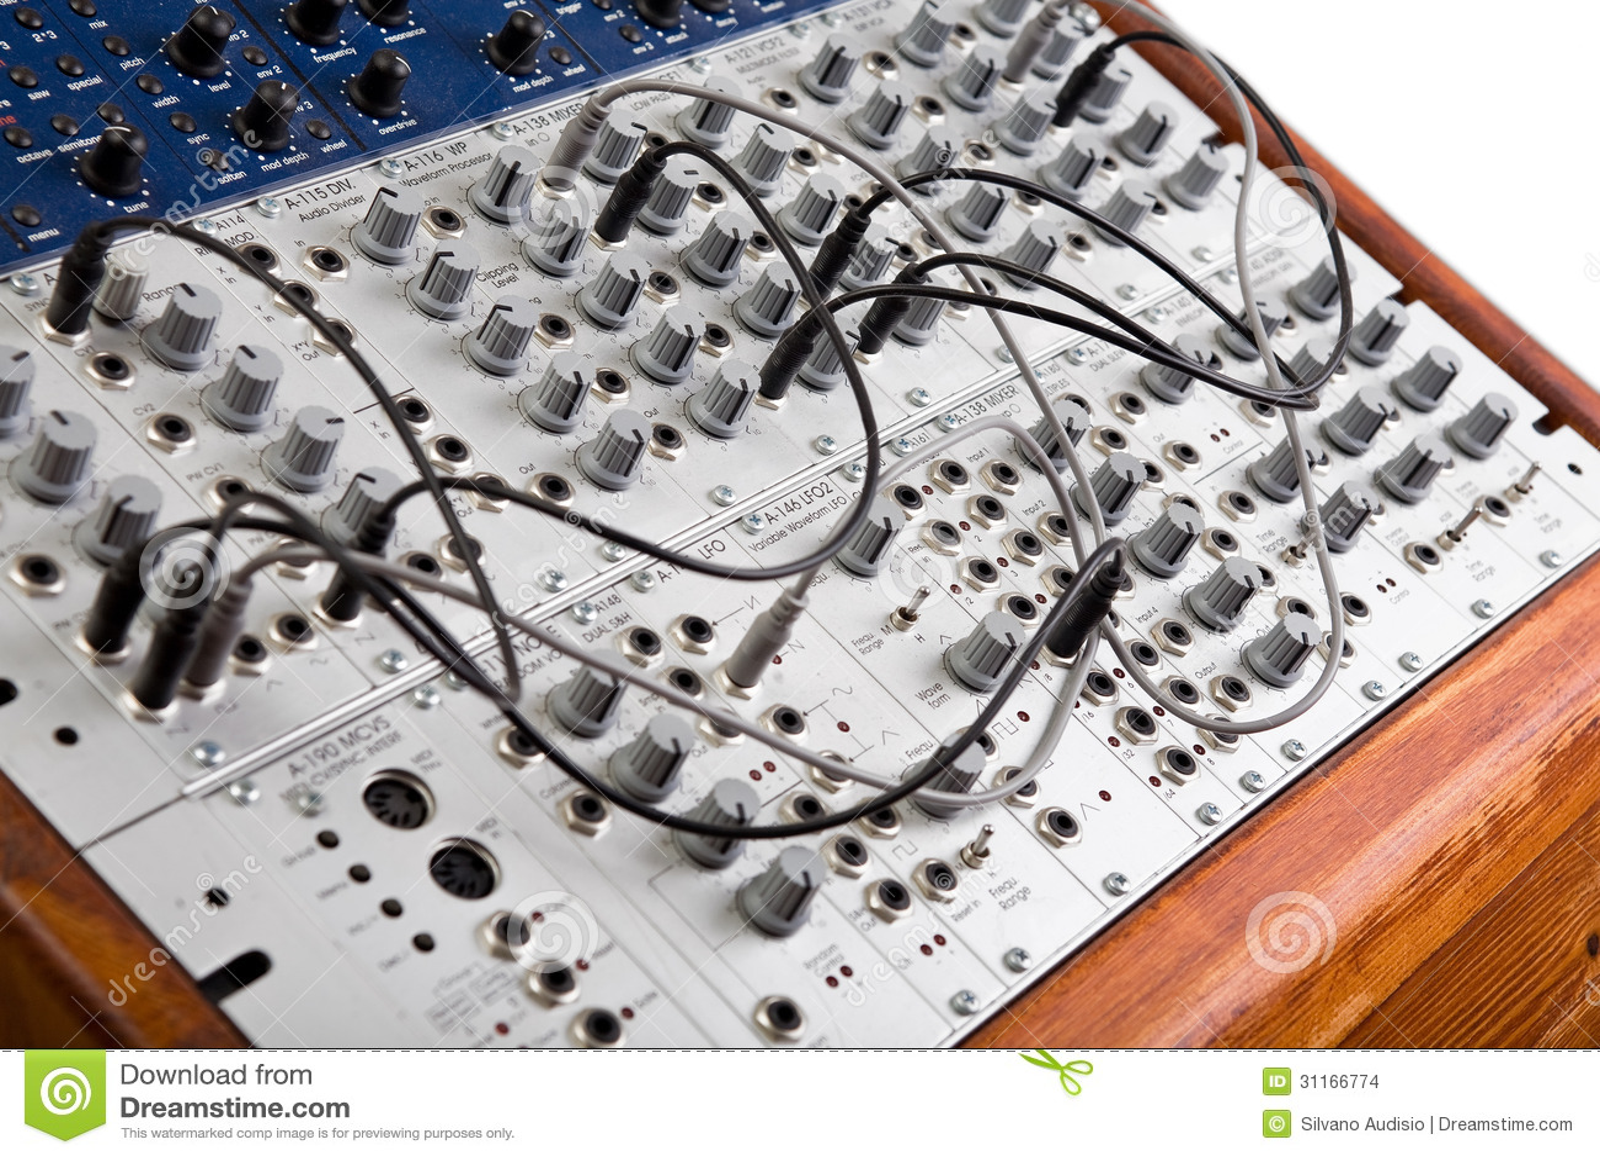 close up of a big modular synthesizer stock images image 31166774. Black Bedroom Furniture Sets. Home Design Ideas